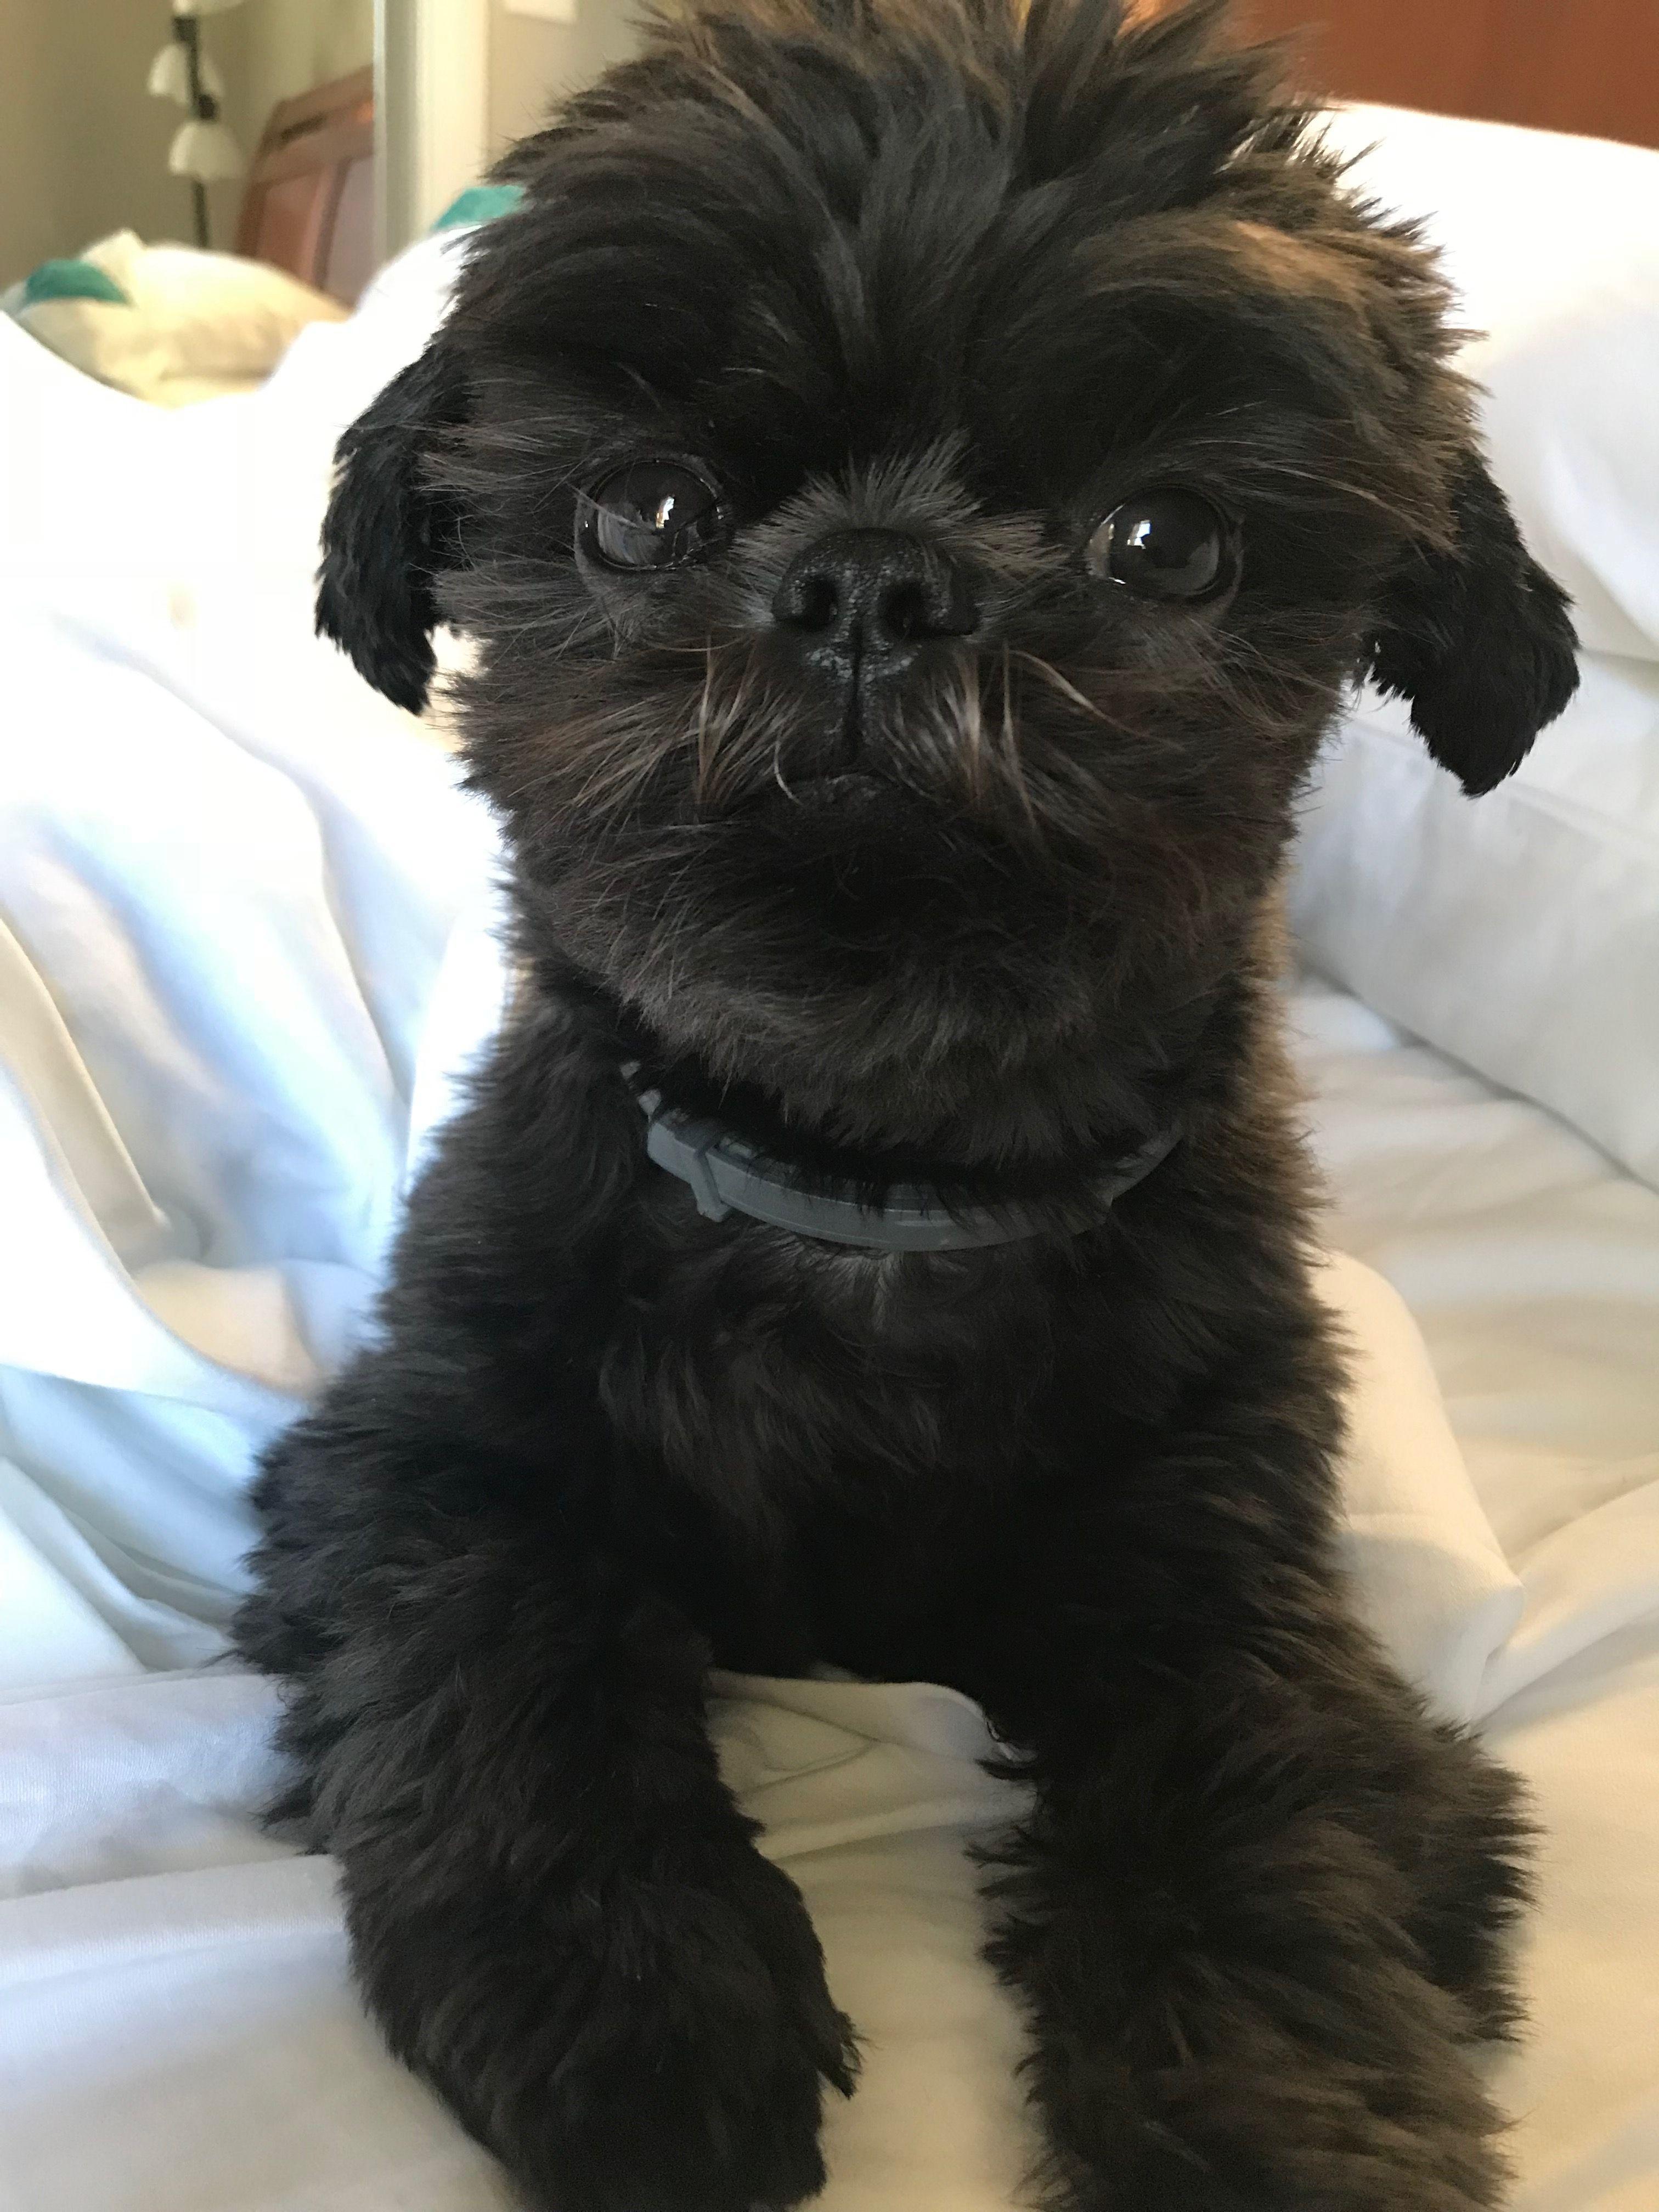 Pin By Sarah Borchardt On Happy Shih Tzu Shih Tzu Dog Dog Friends